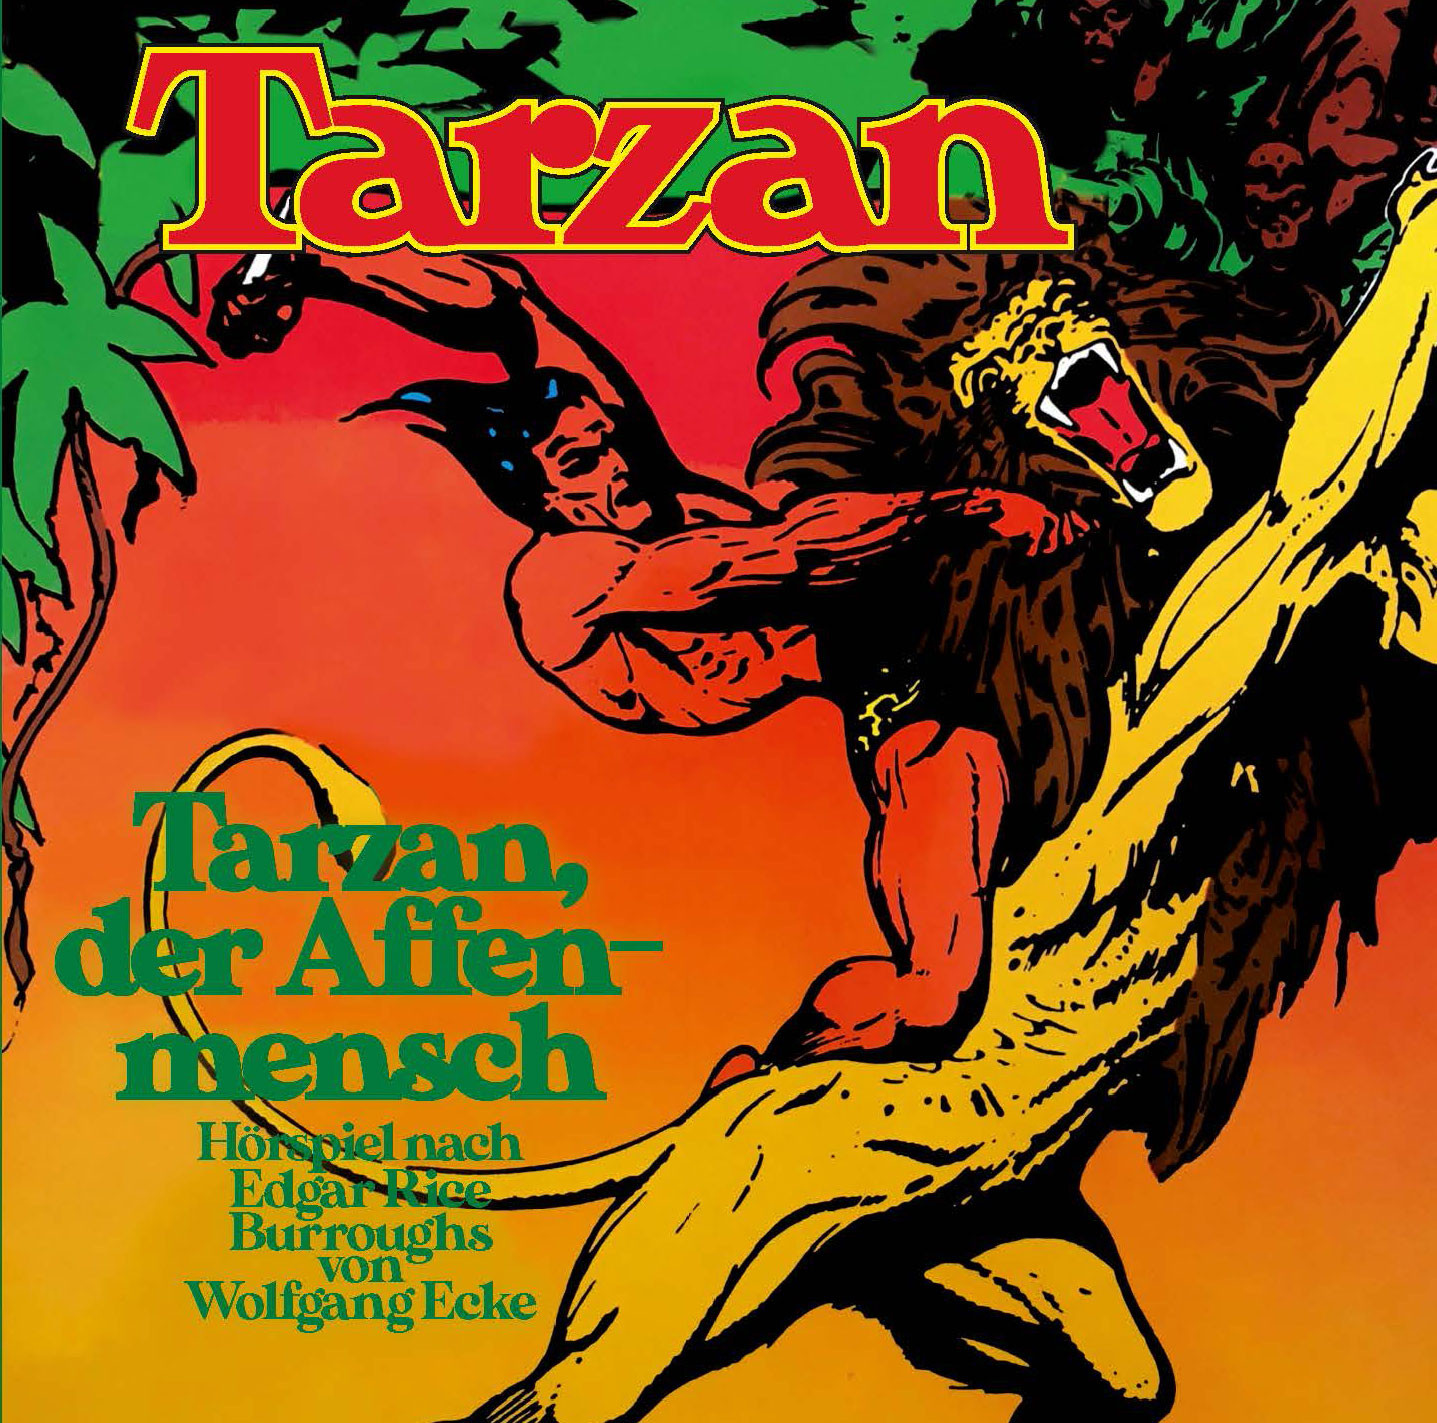 Tarzan - Folge 1: Tarzan, der Affenmensch